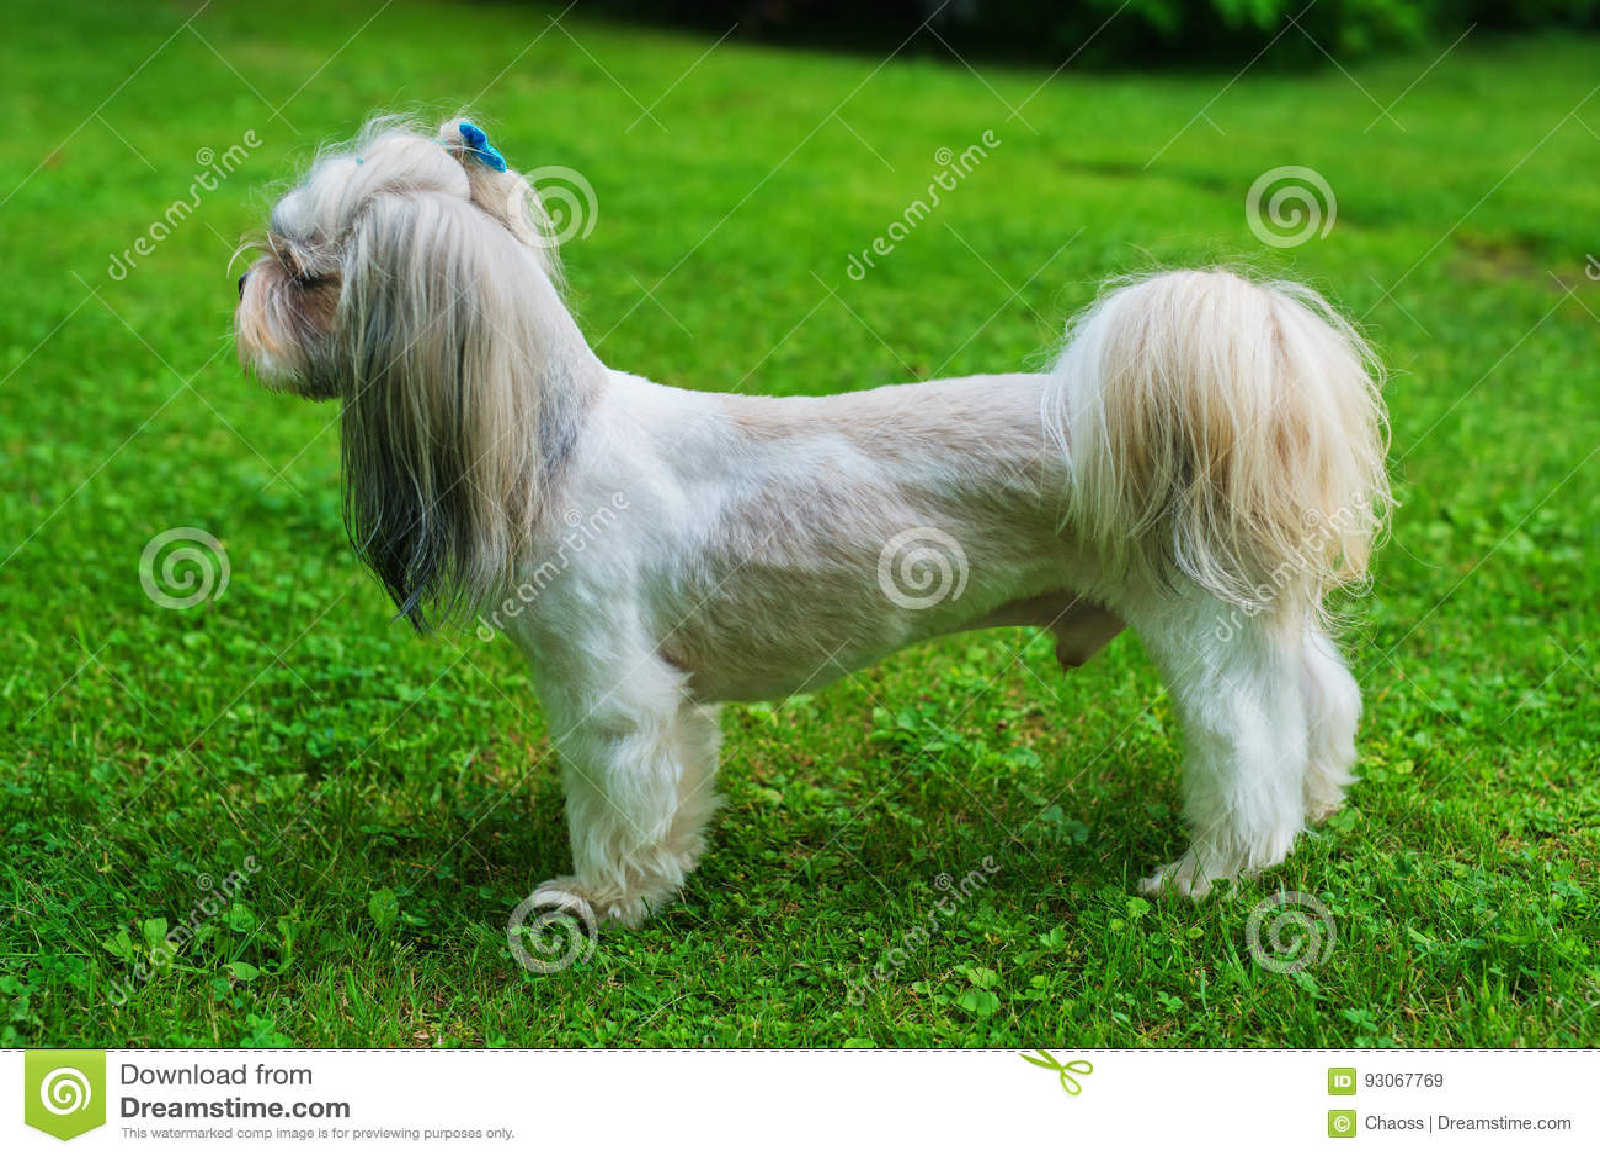 Shih Tzu Dog Stock Image Image Of Countryside Purebred 93067769